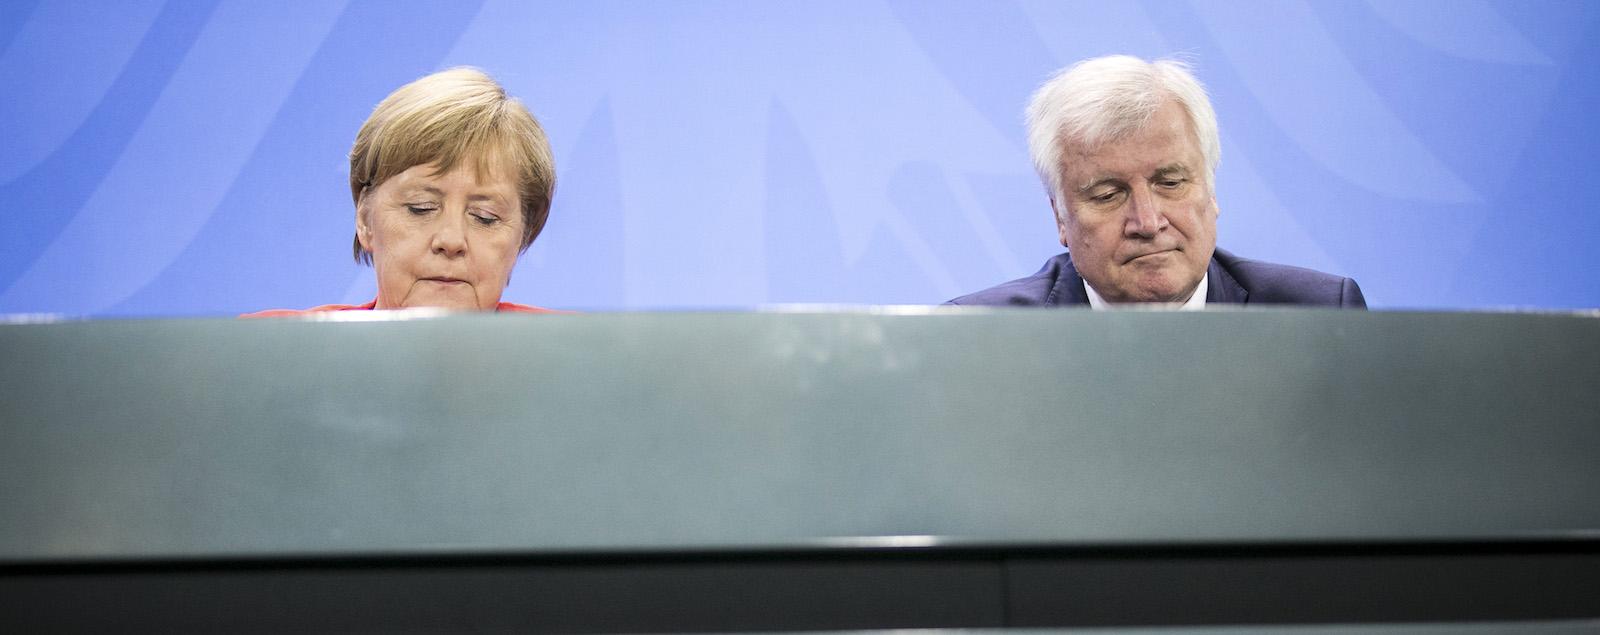 Photo: Florian Gaertner/Getty